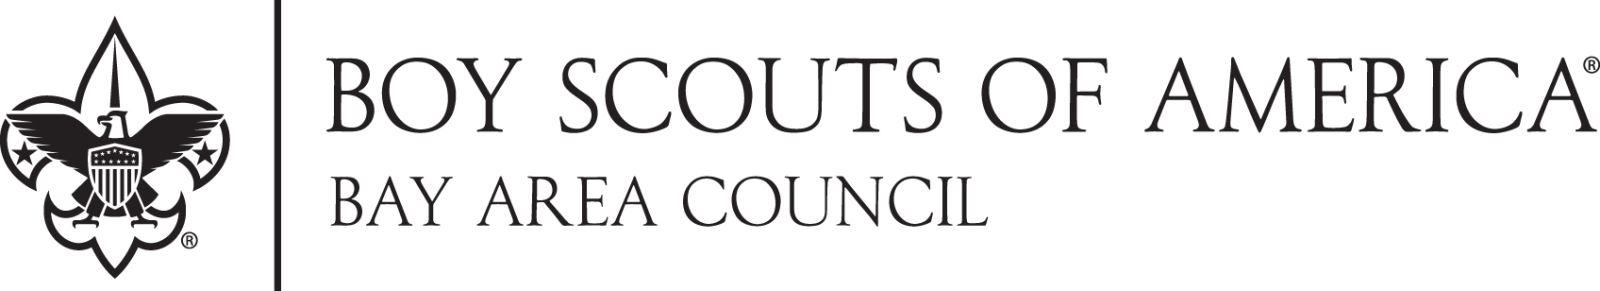 Boy Scouts of America -